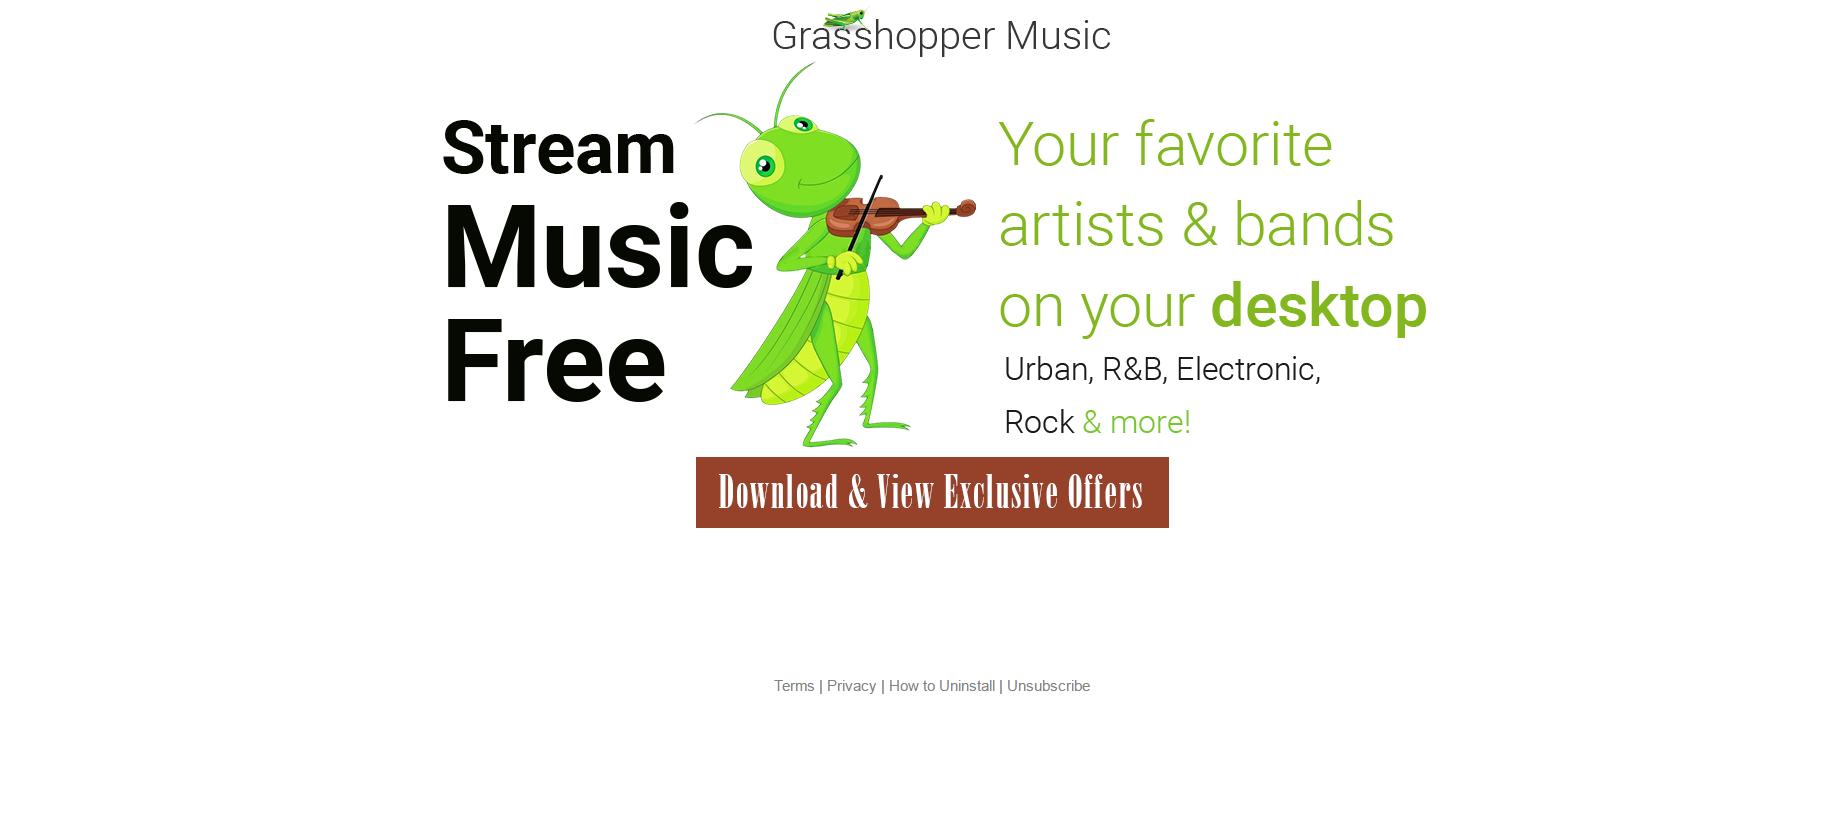 Grasshopper Music Ads